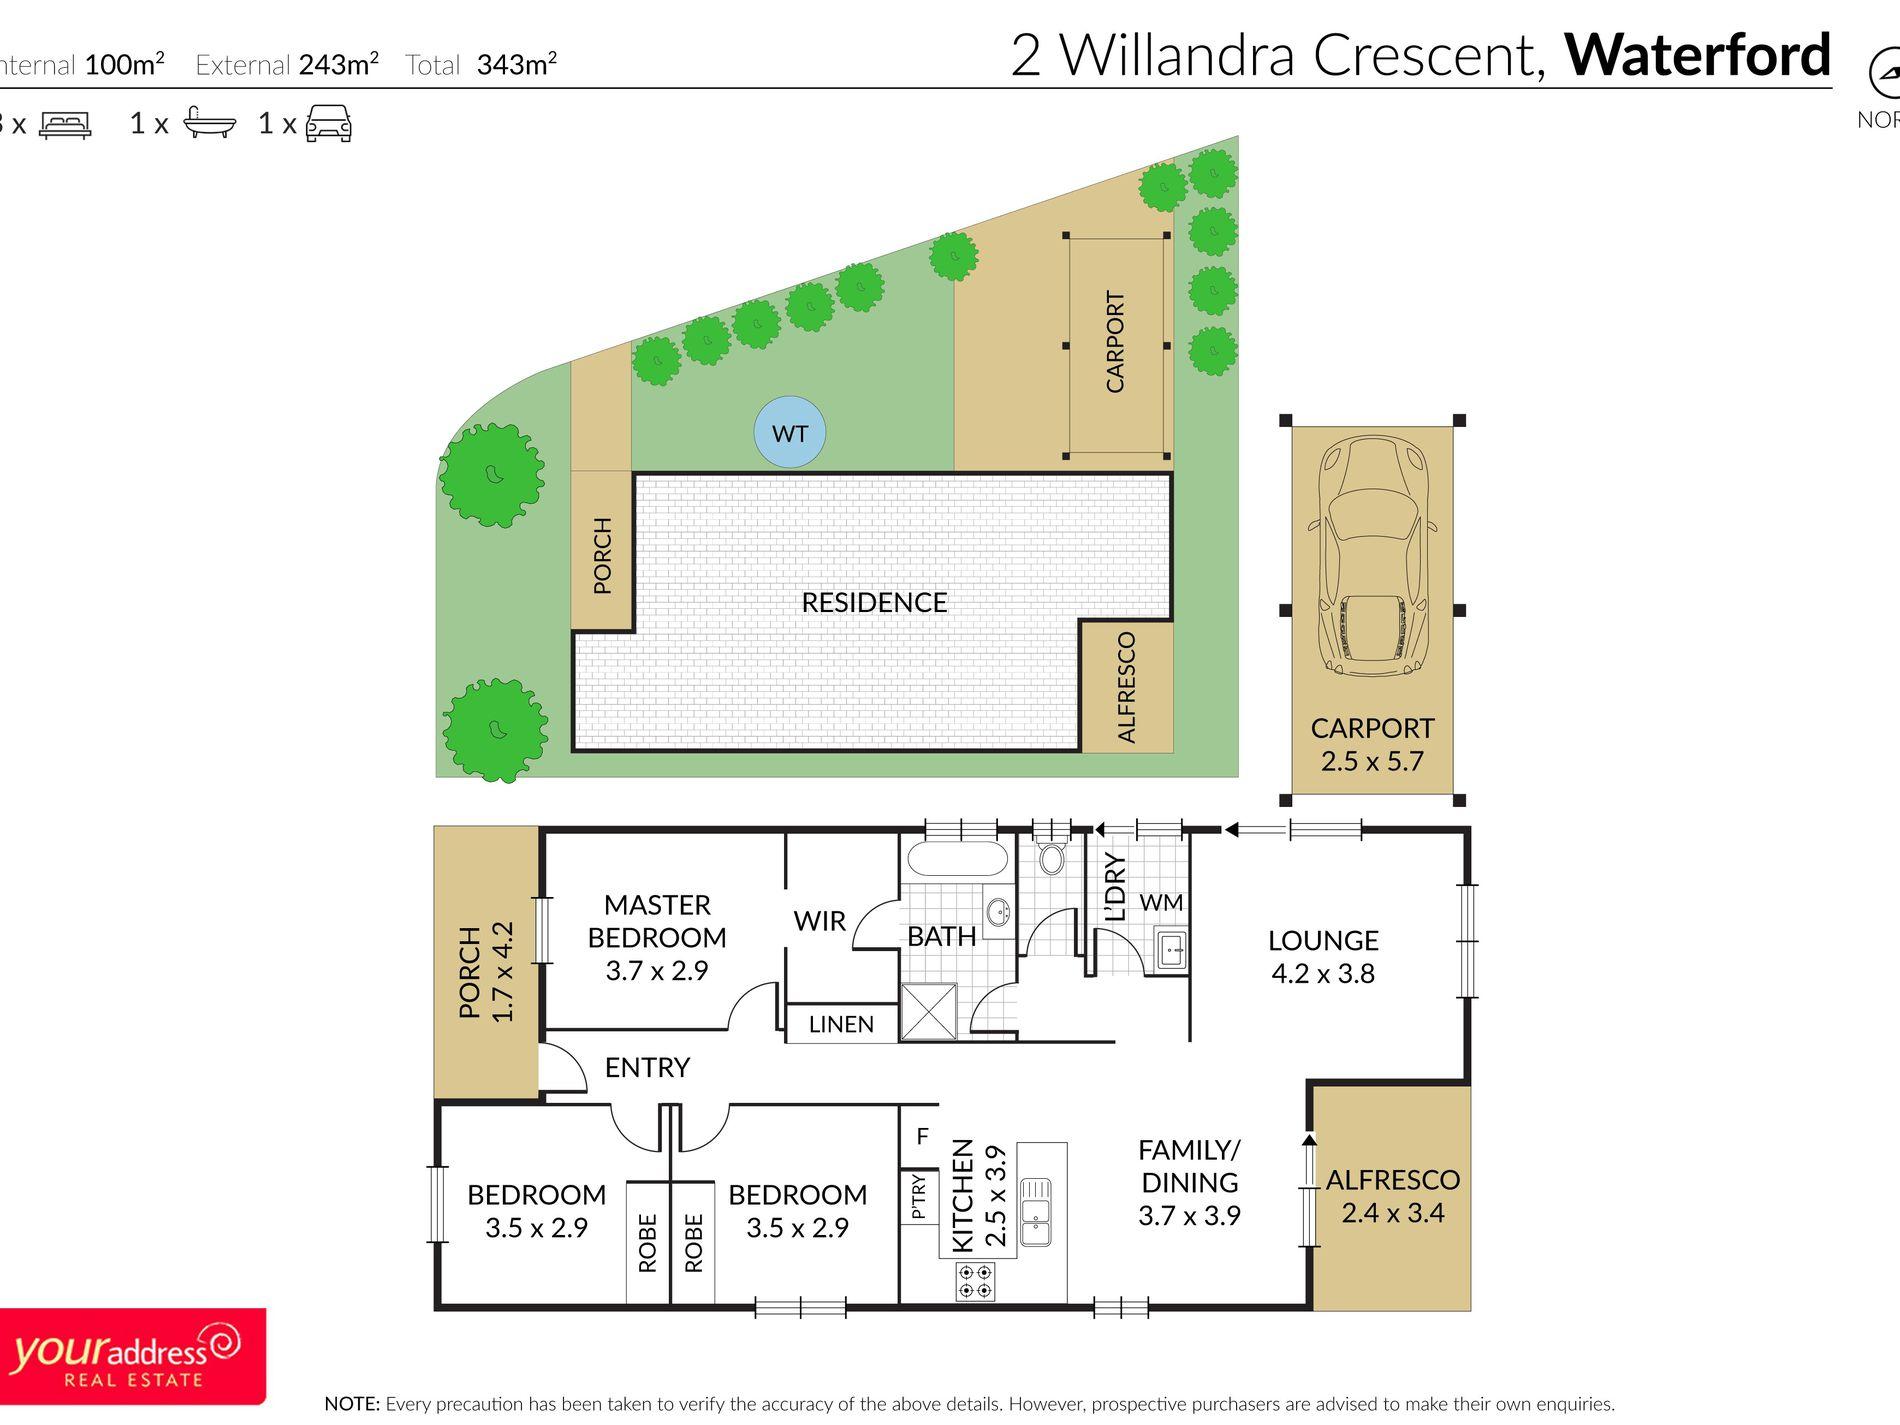 2 Willandra Crescent, Waterford